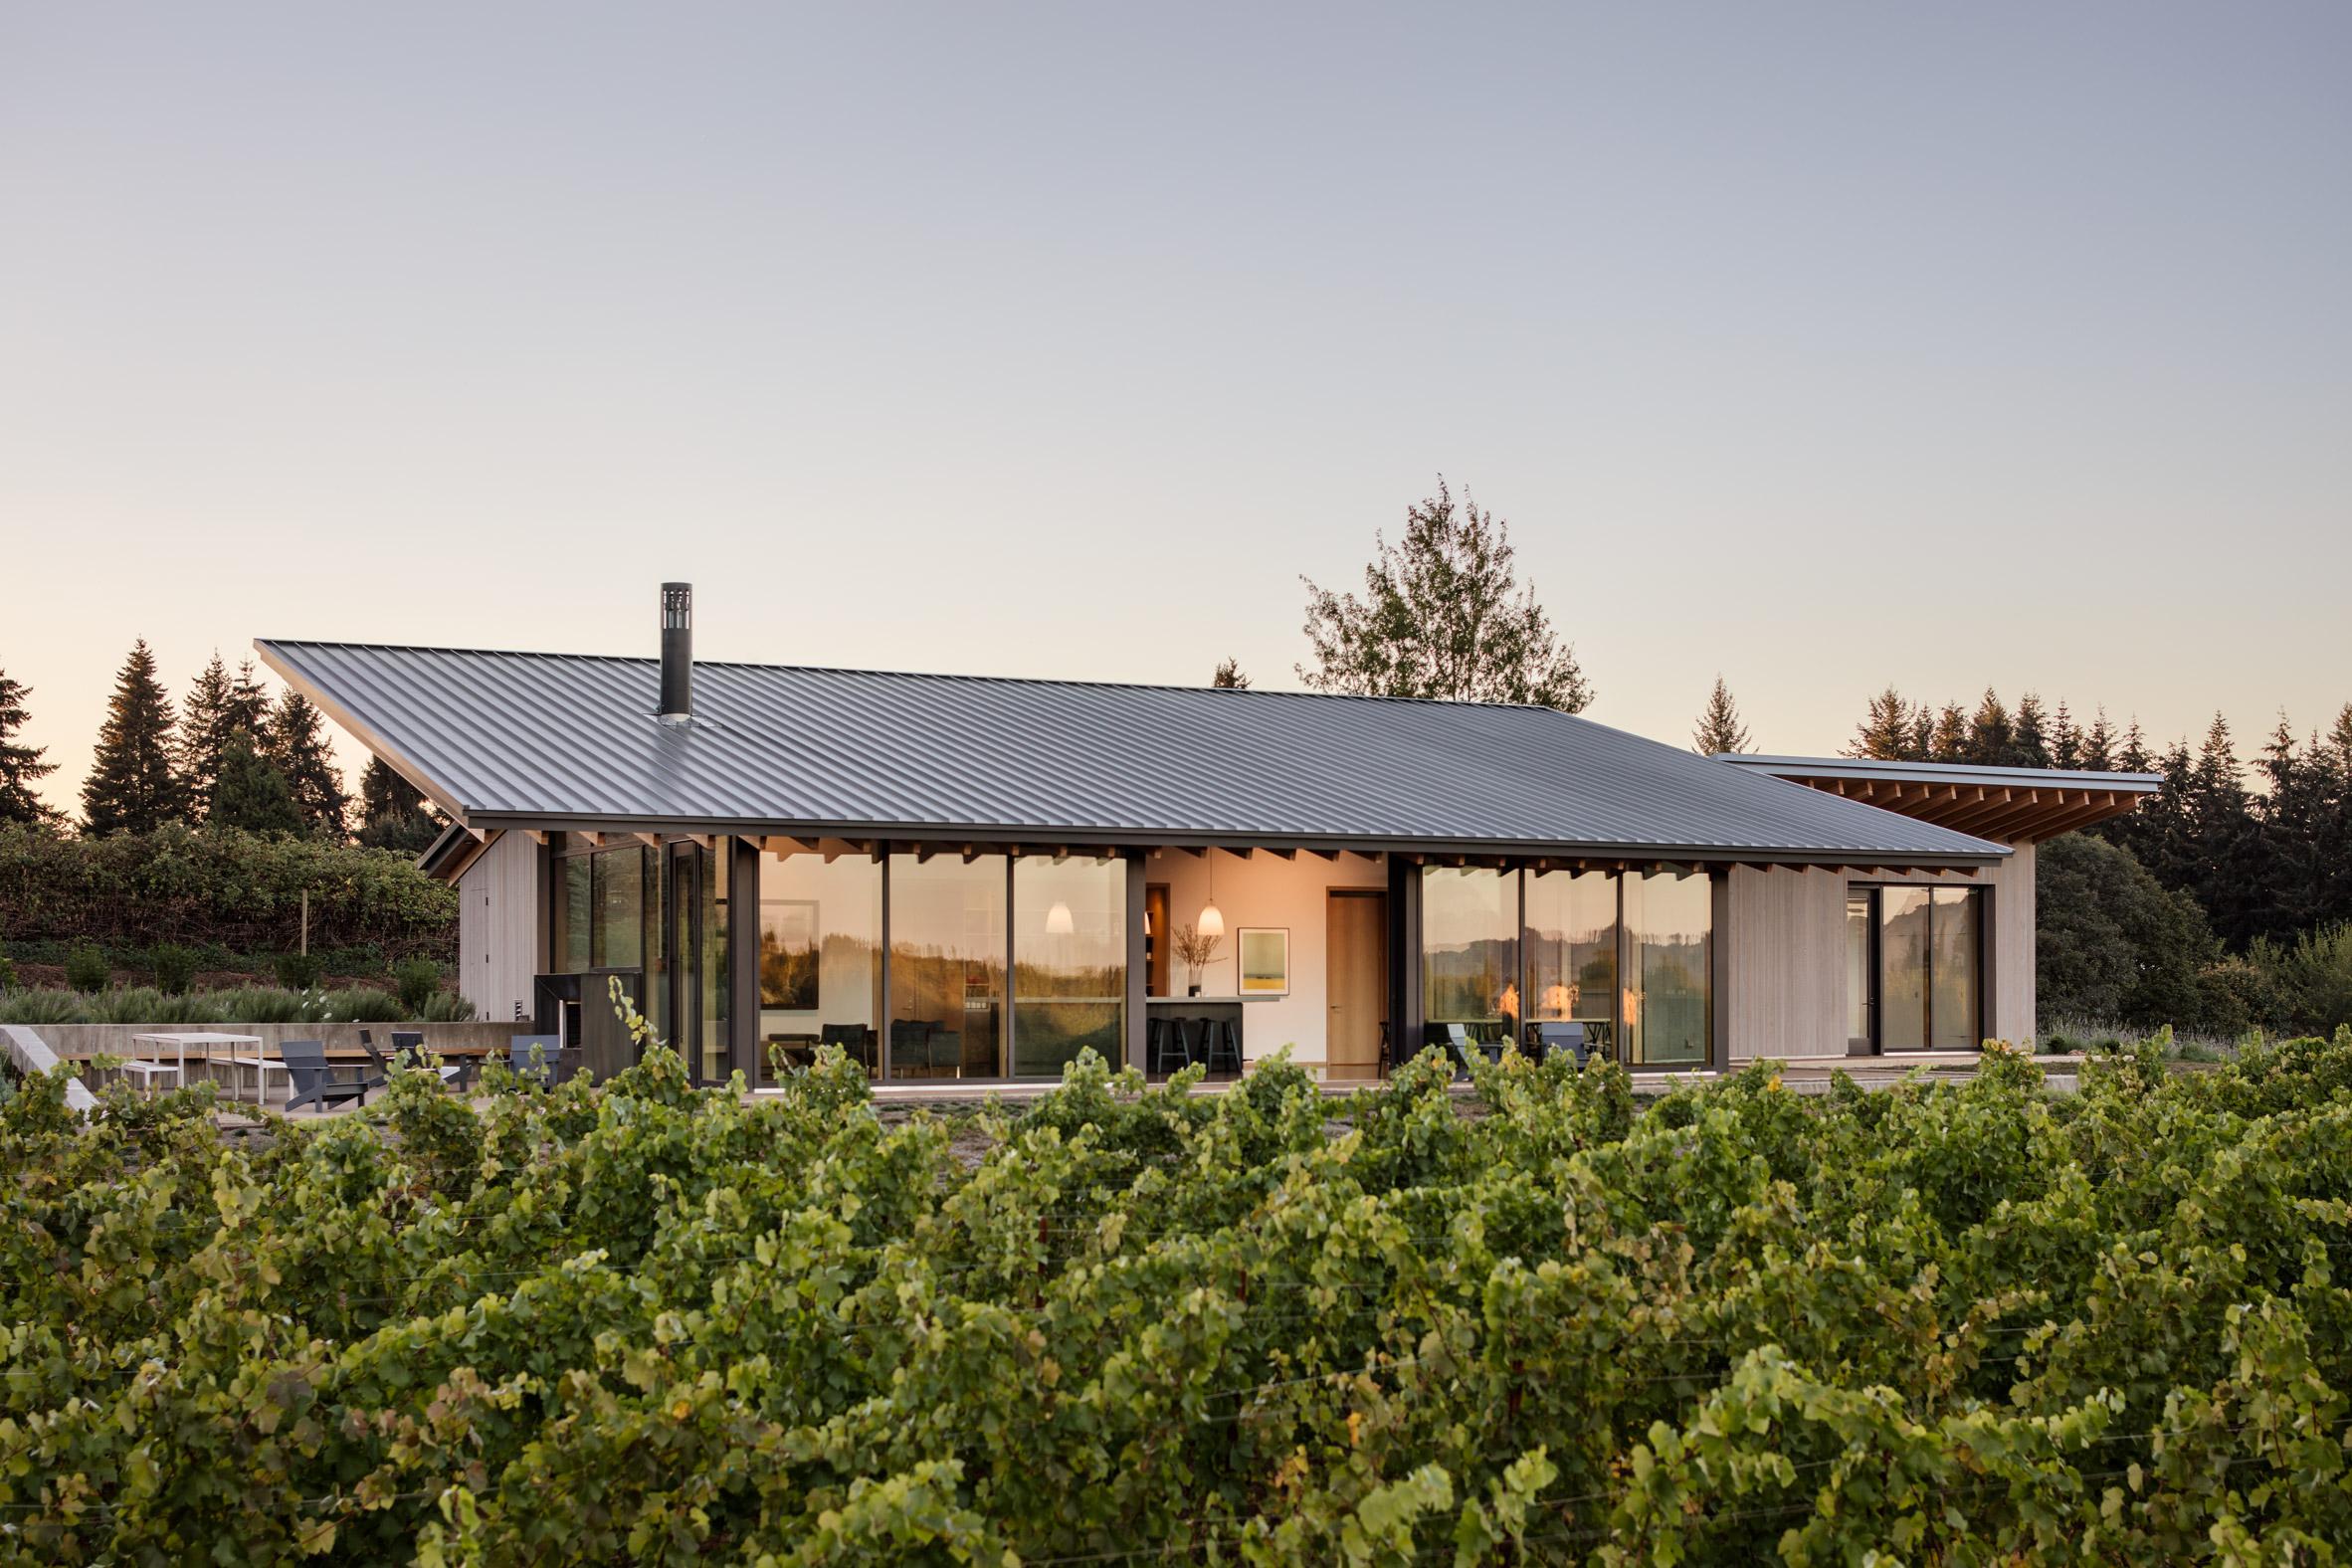 lever architecture Lever Architecture designs Stunning Wine Tasting Room in Oregon Lever Architecture designs Stunning Wine Tasting Room in Oregon 4